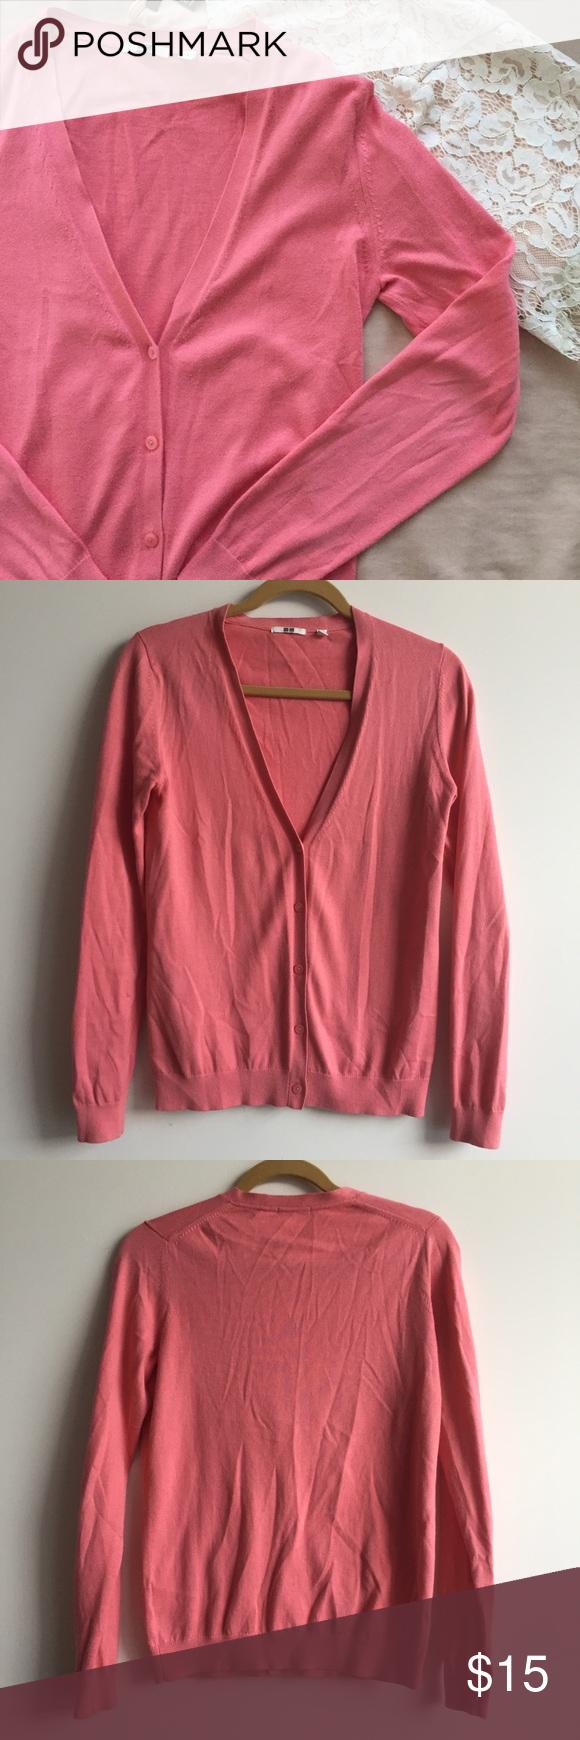 Uniqlo coral cardigan | Sweater cardigan, Coral cardigan and Cardigans